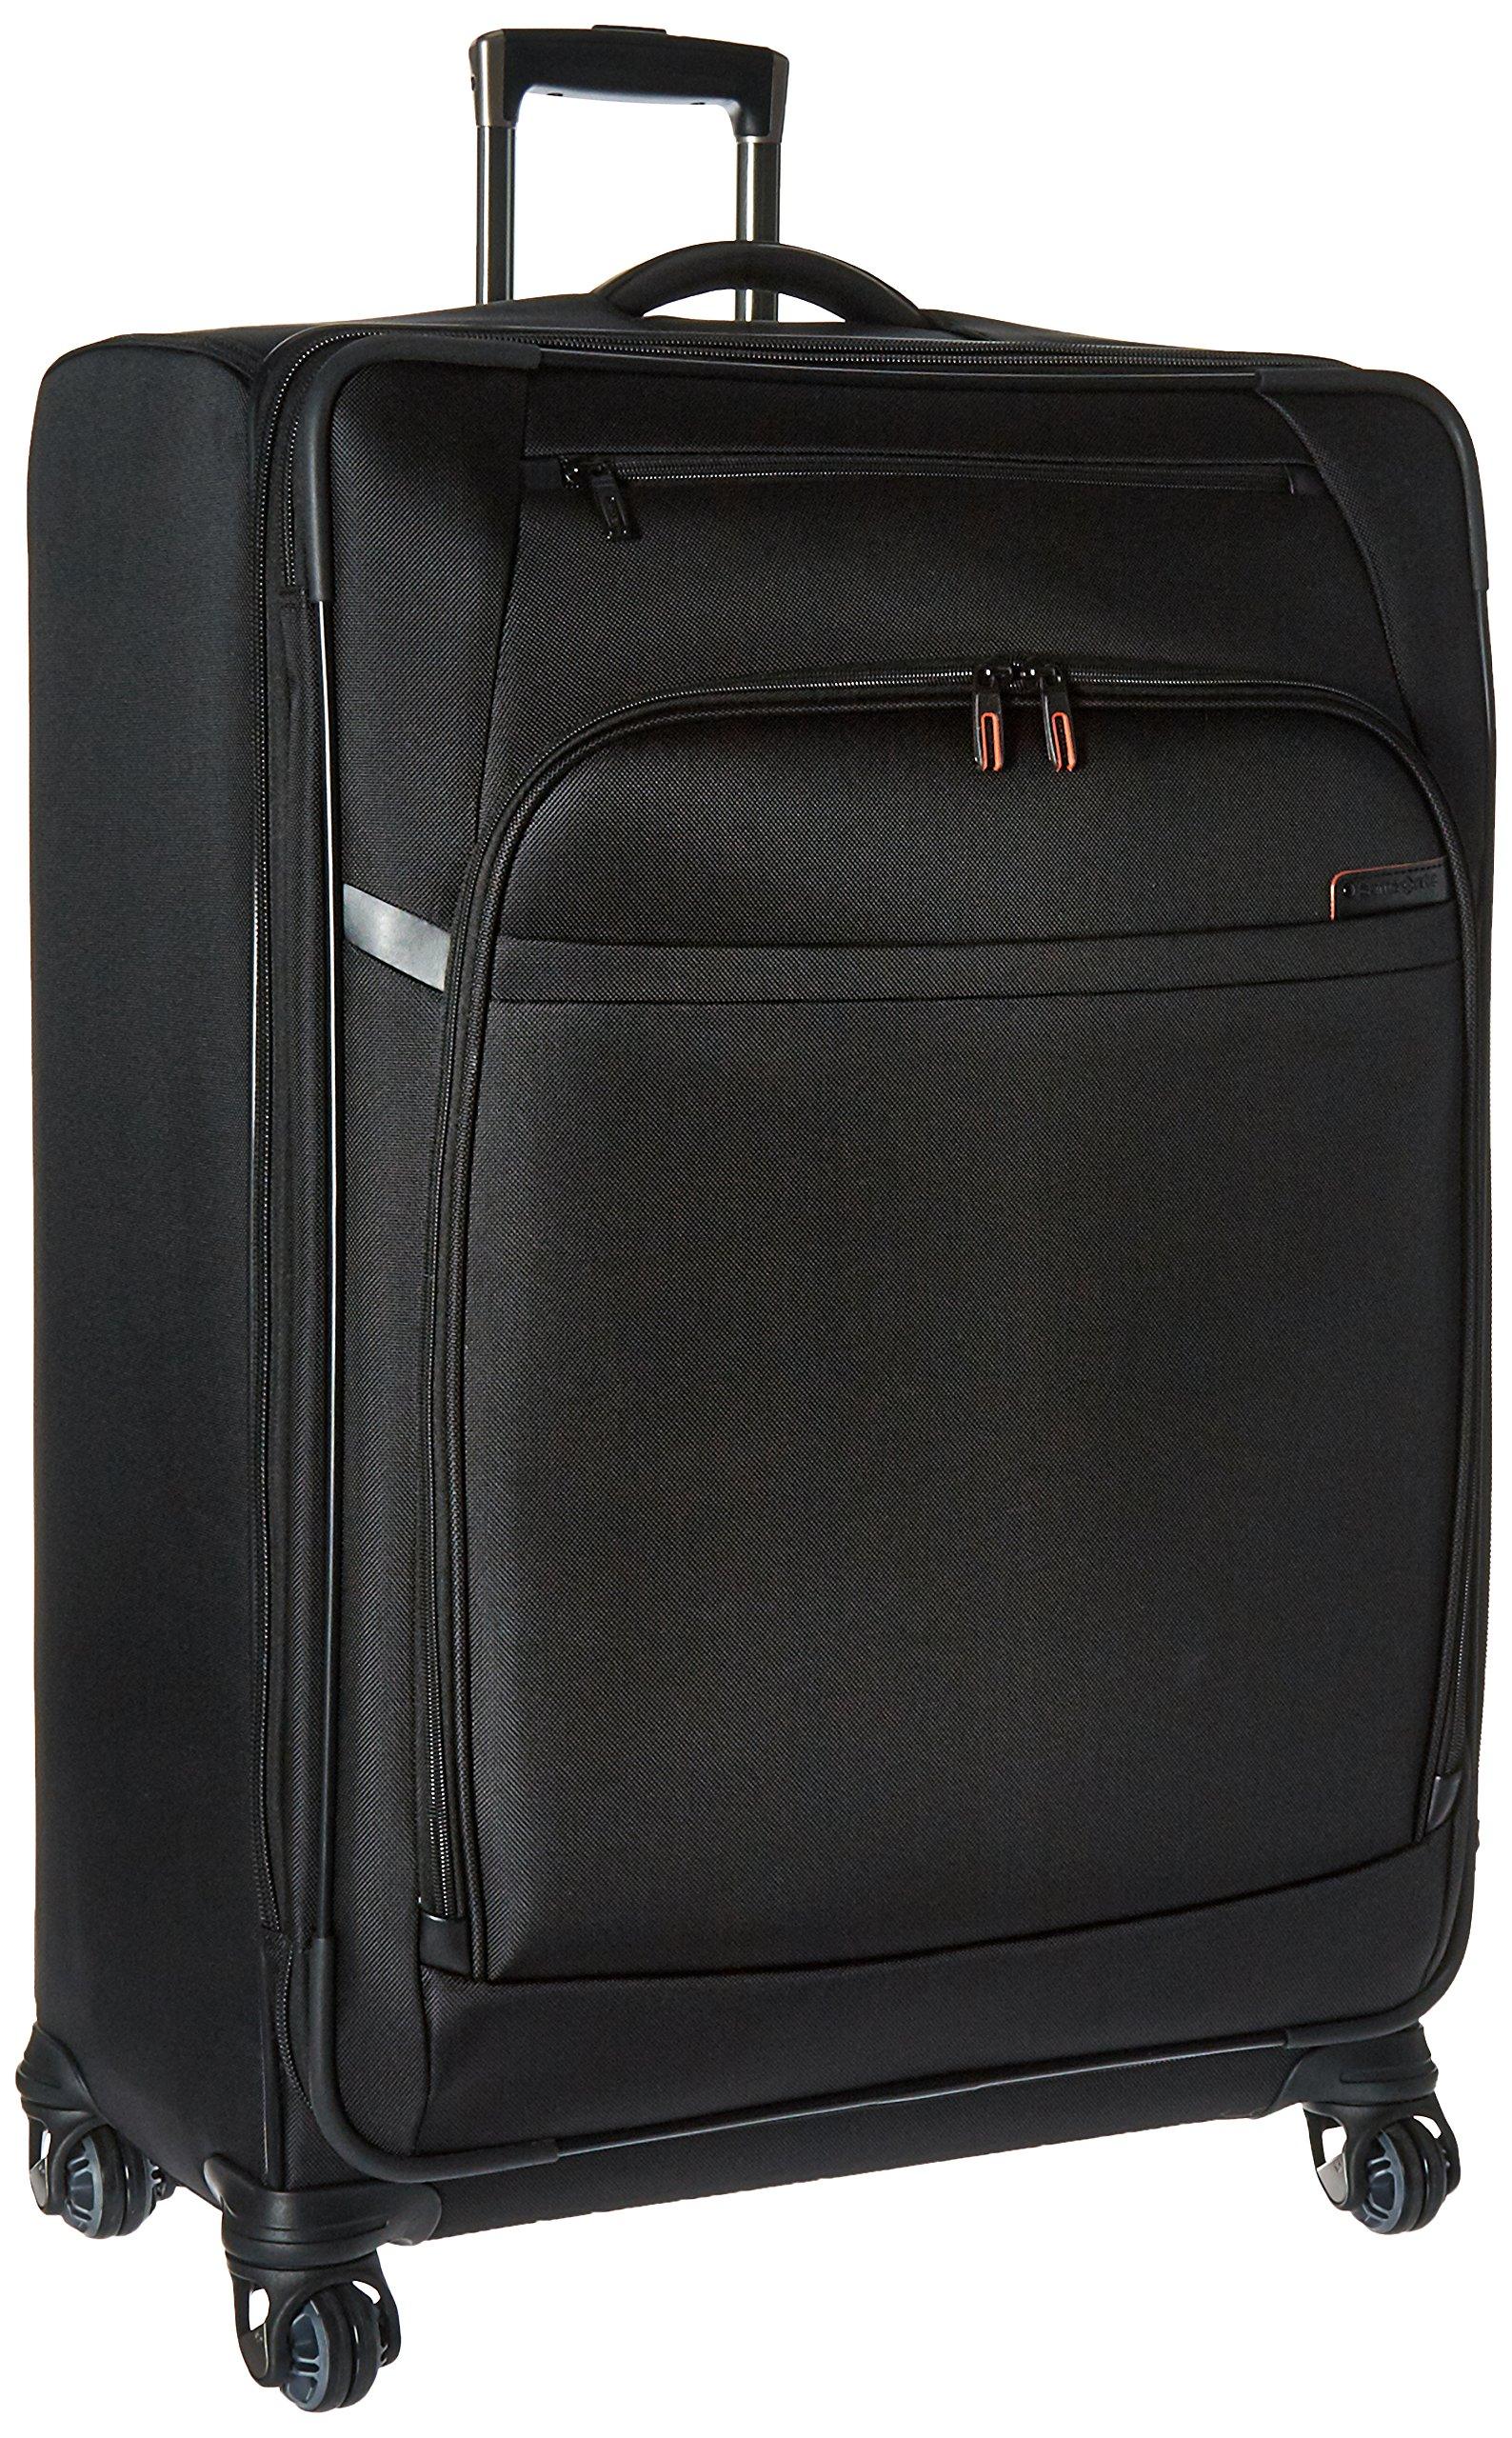 Samsonite Pro 4 DLX Expandable 29 Suitcases, Black